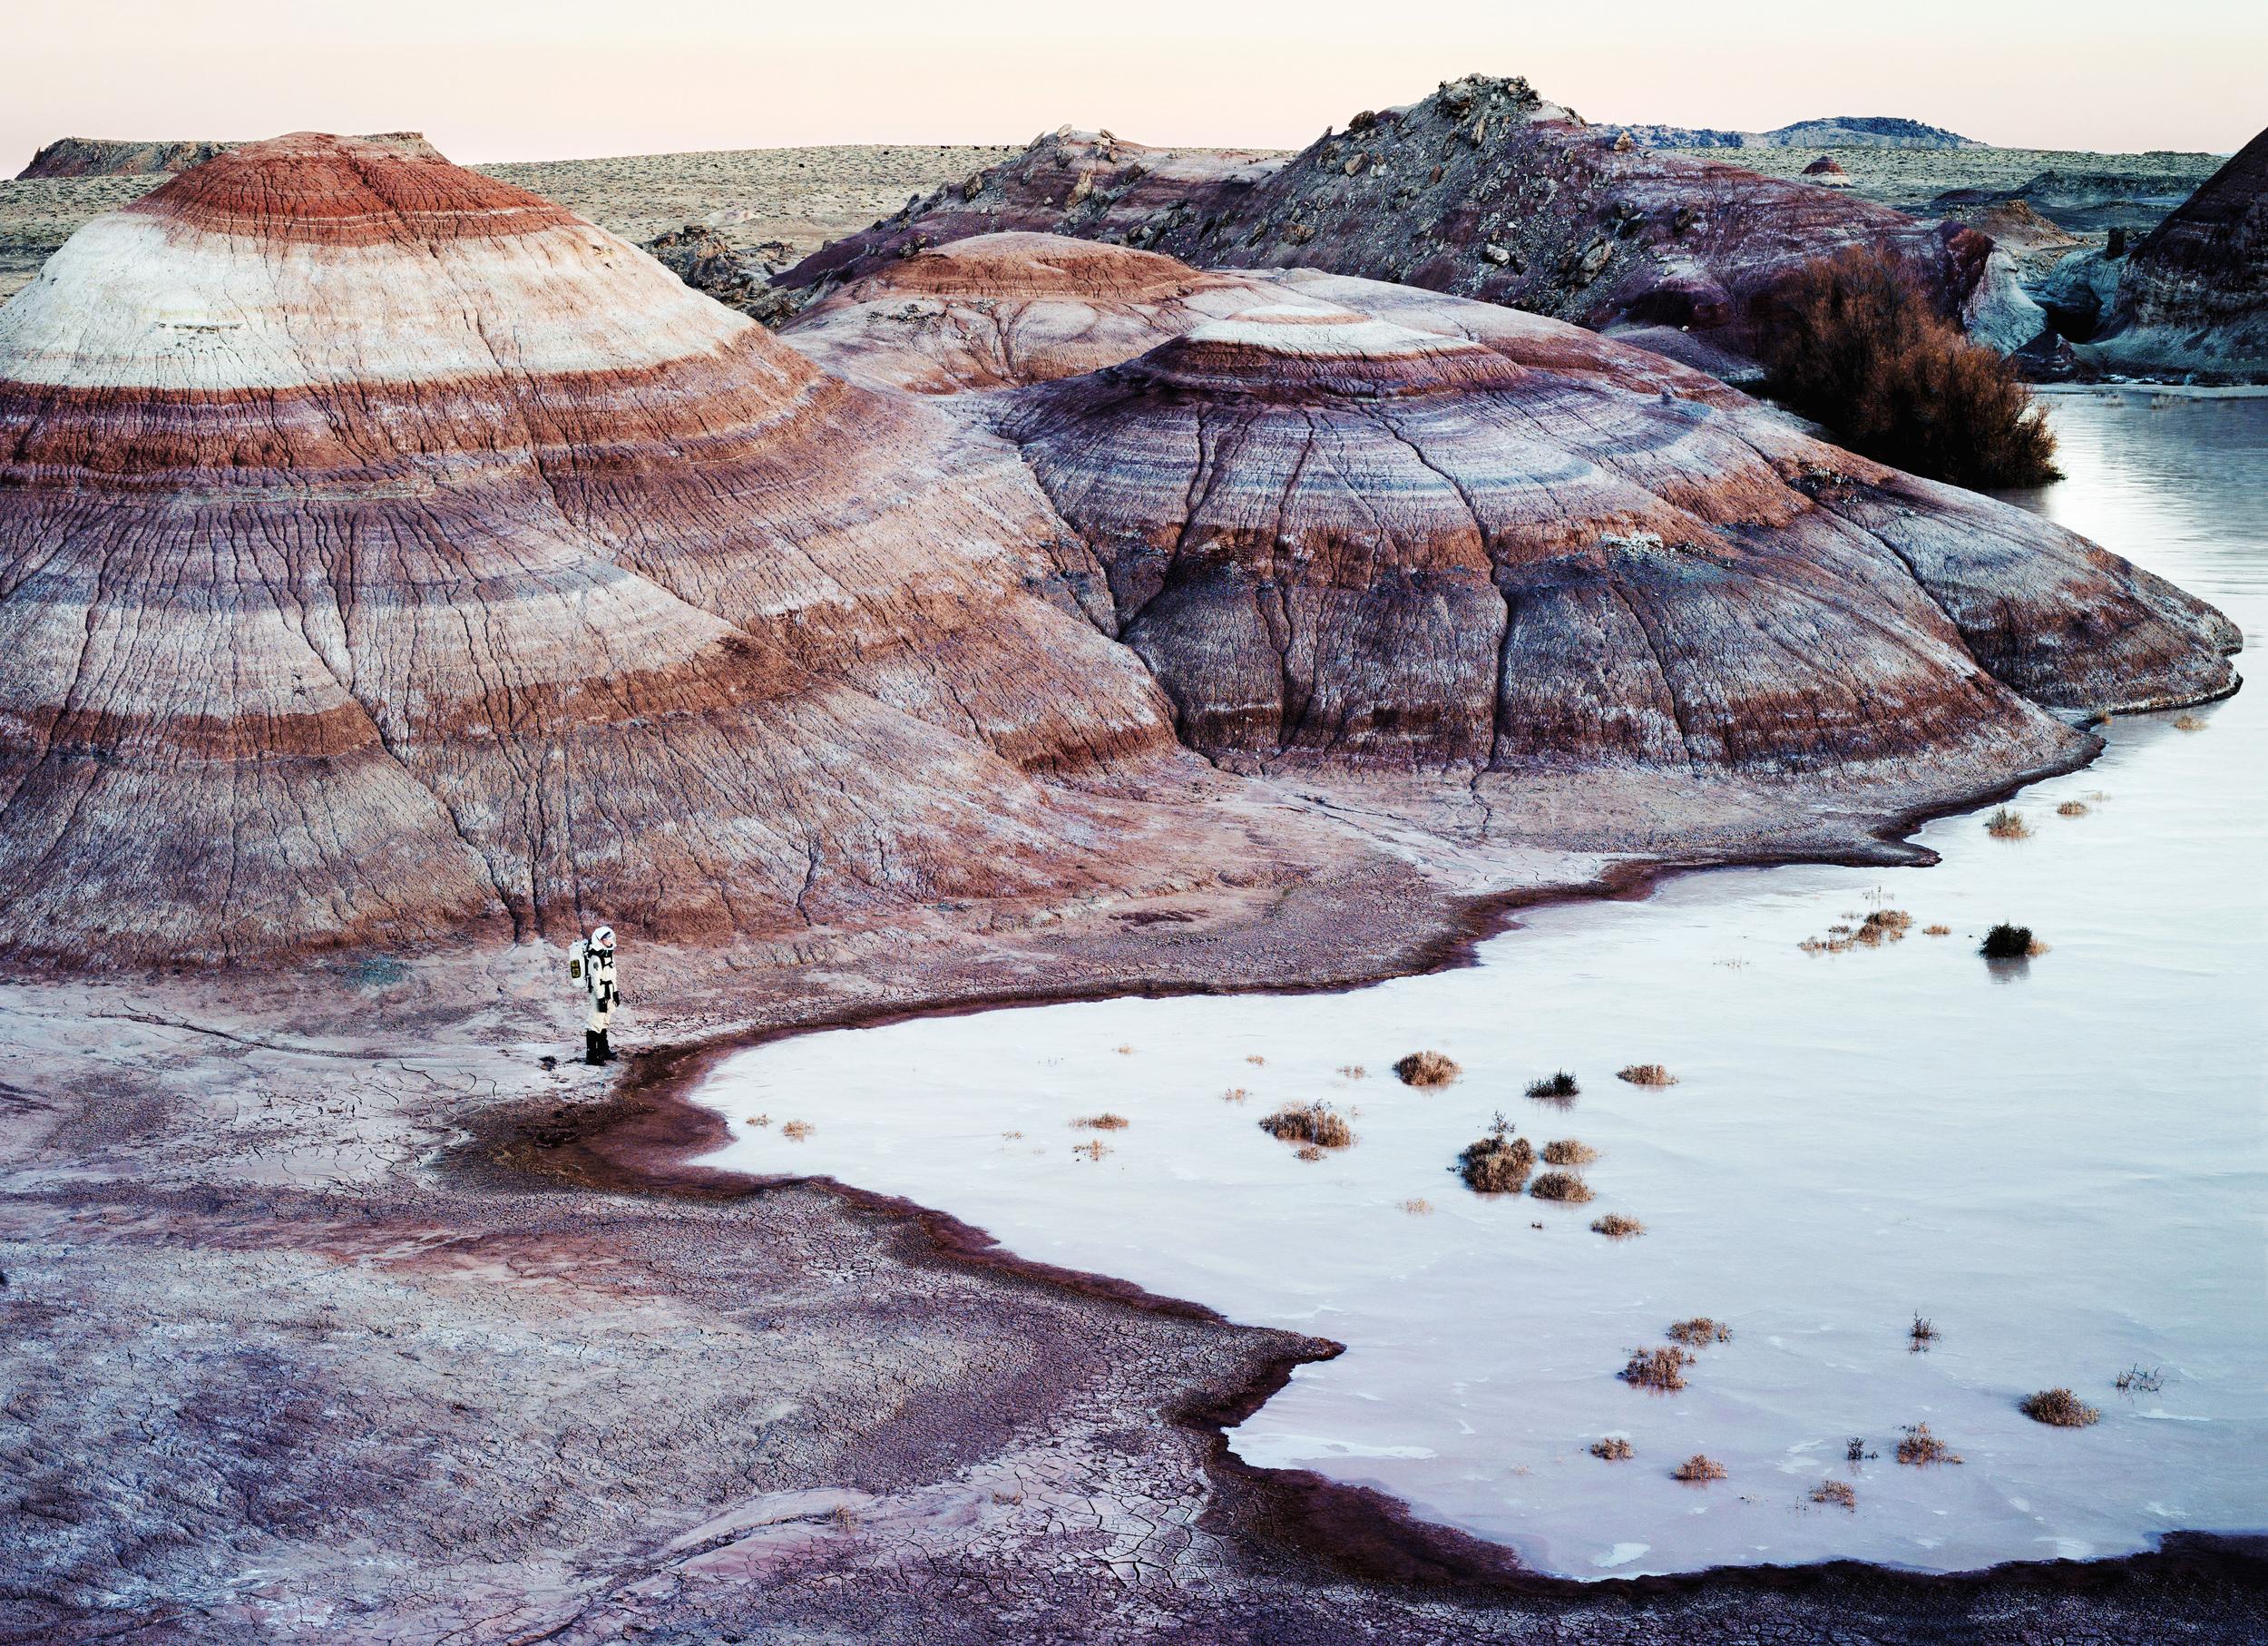 Mars Desert Research Station #6  火星協會,聖拉斐爾膨脹,猶他州,美國, 2008  100x 300 厘米/ 153 x 200 厘米/ 180 x 235 厘米